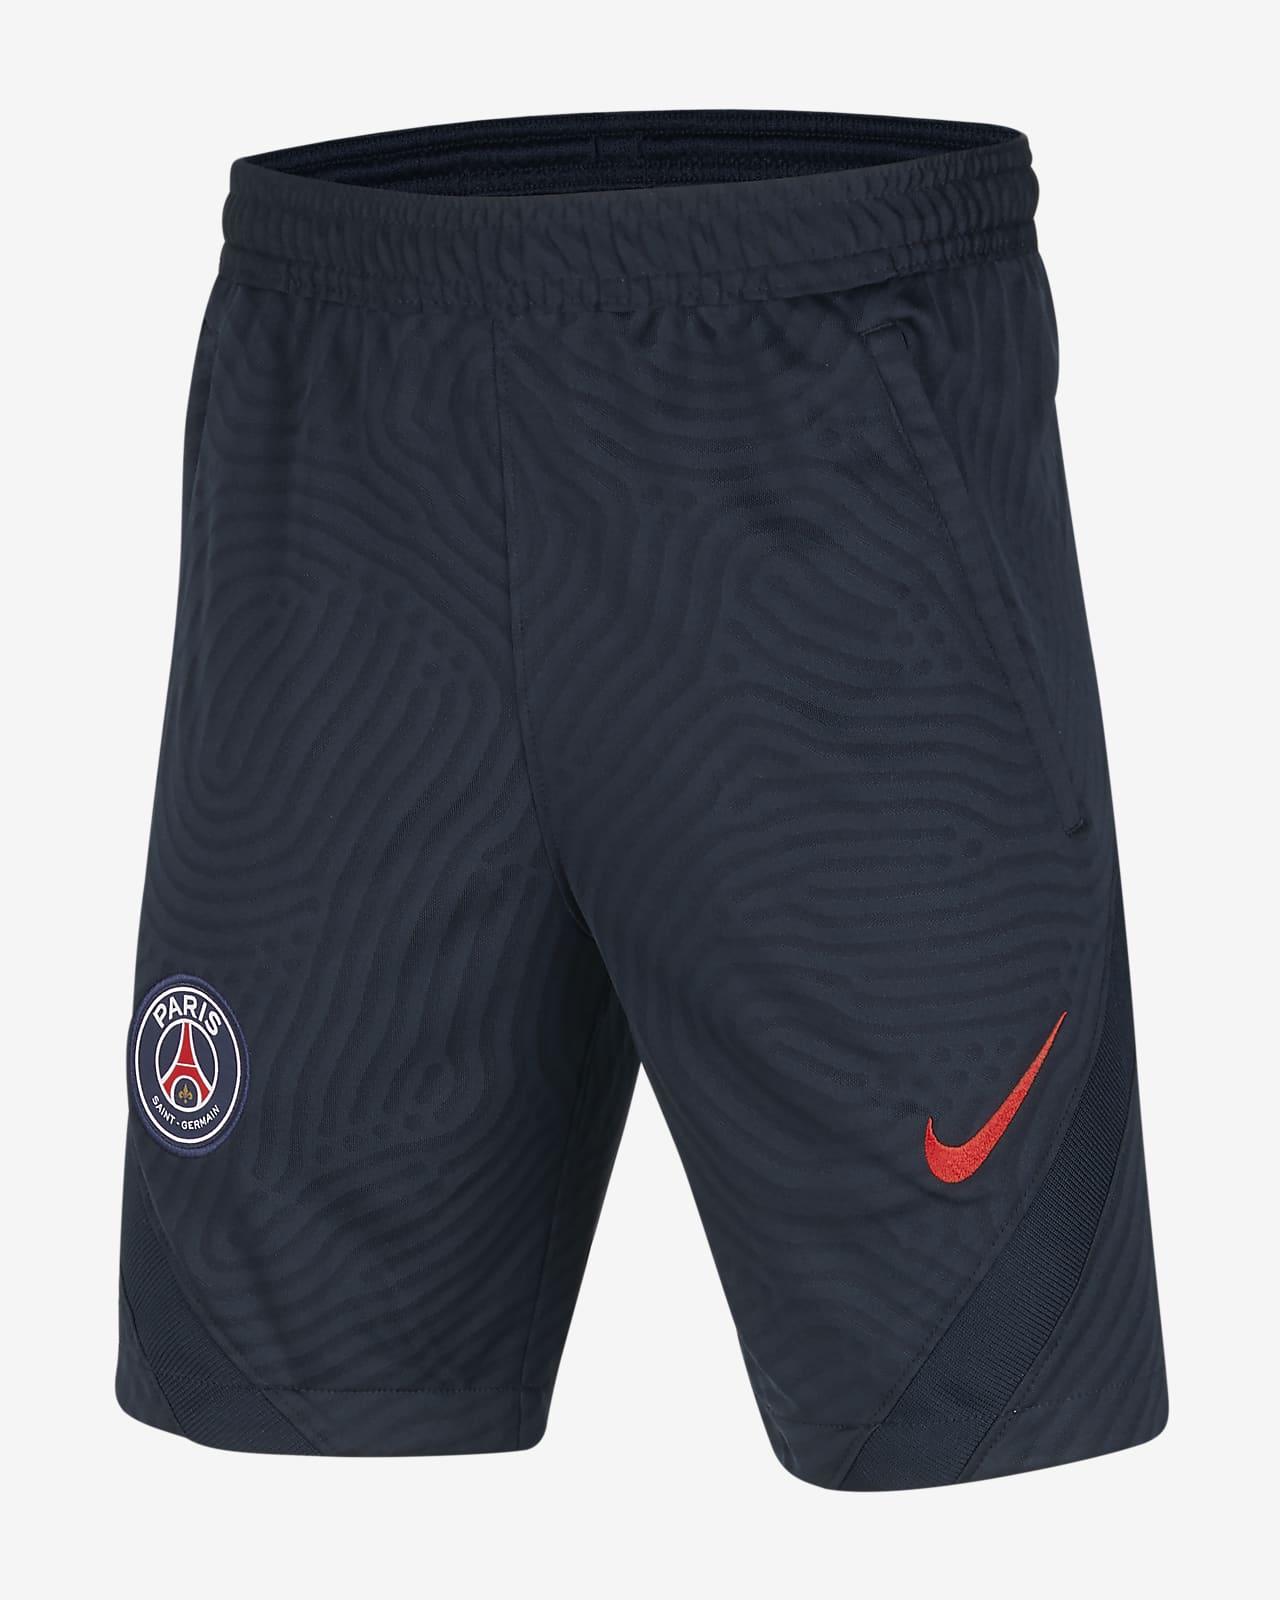 Shorts de fútbol jacquard para niños talla grande Paris Saint-Germain Strike